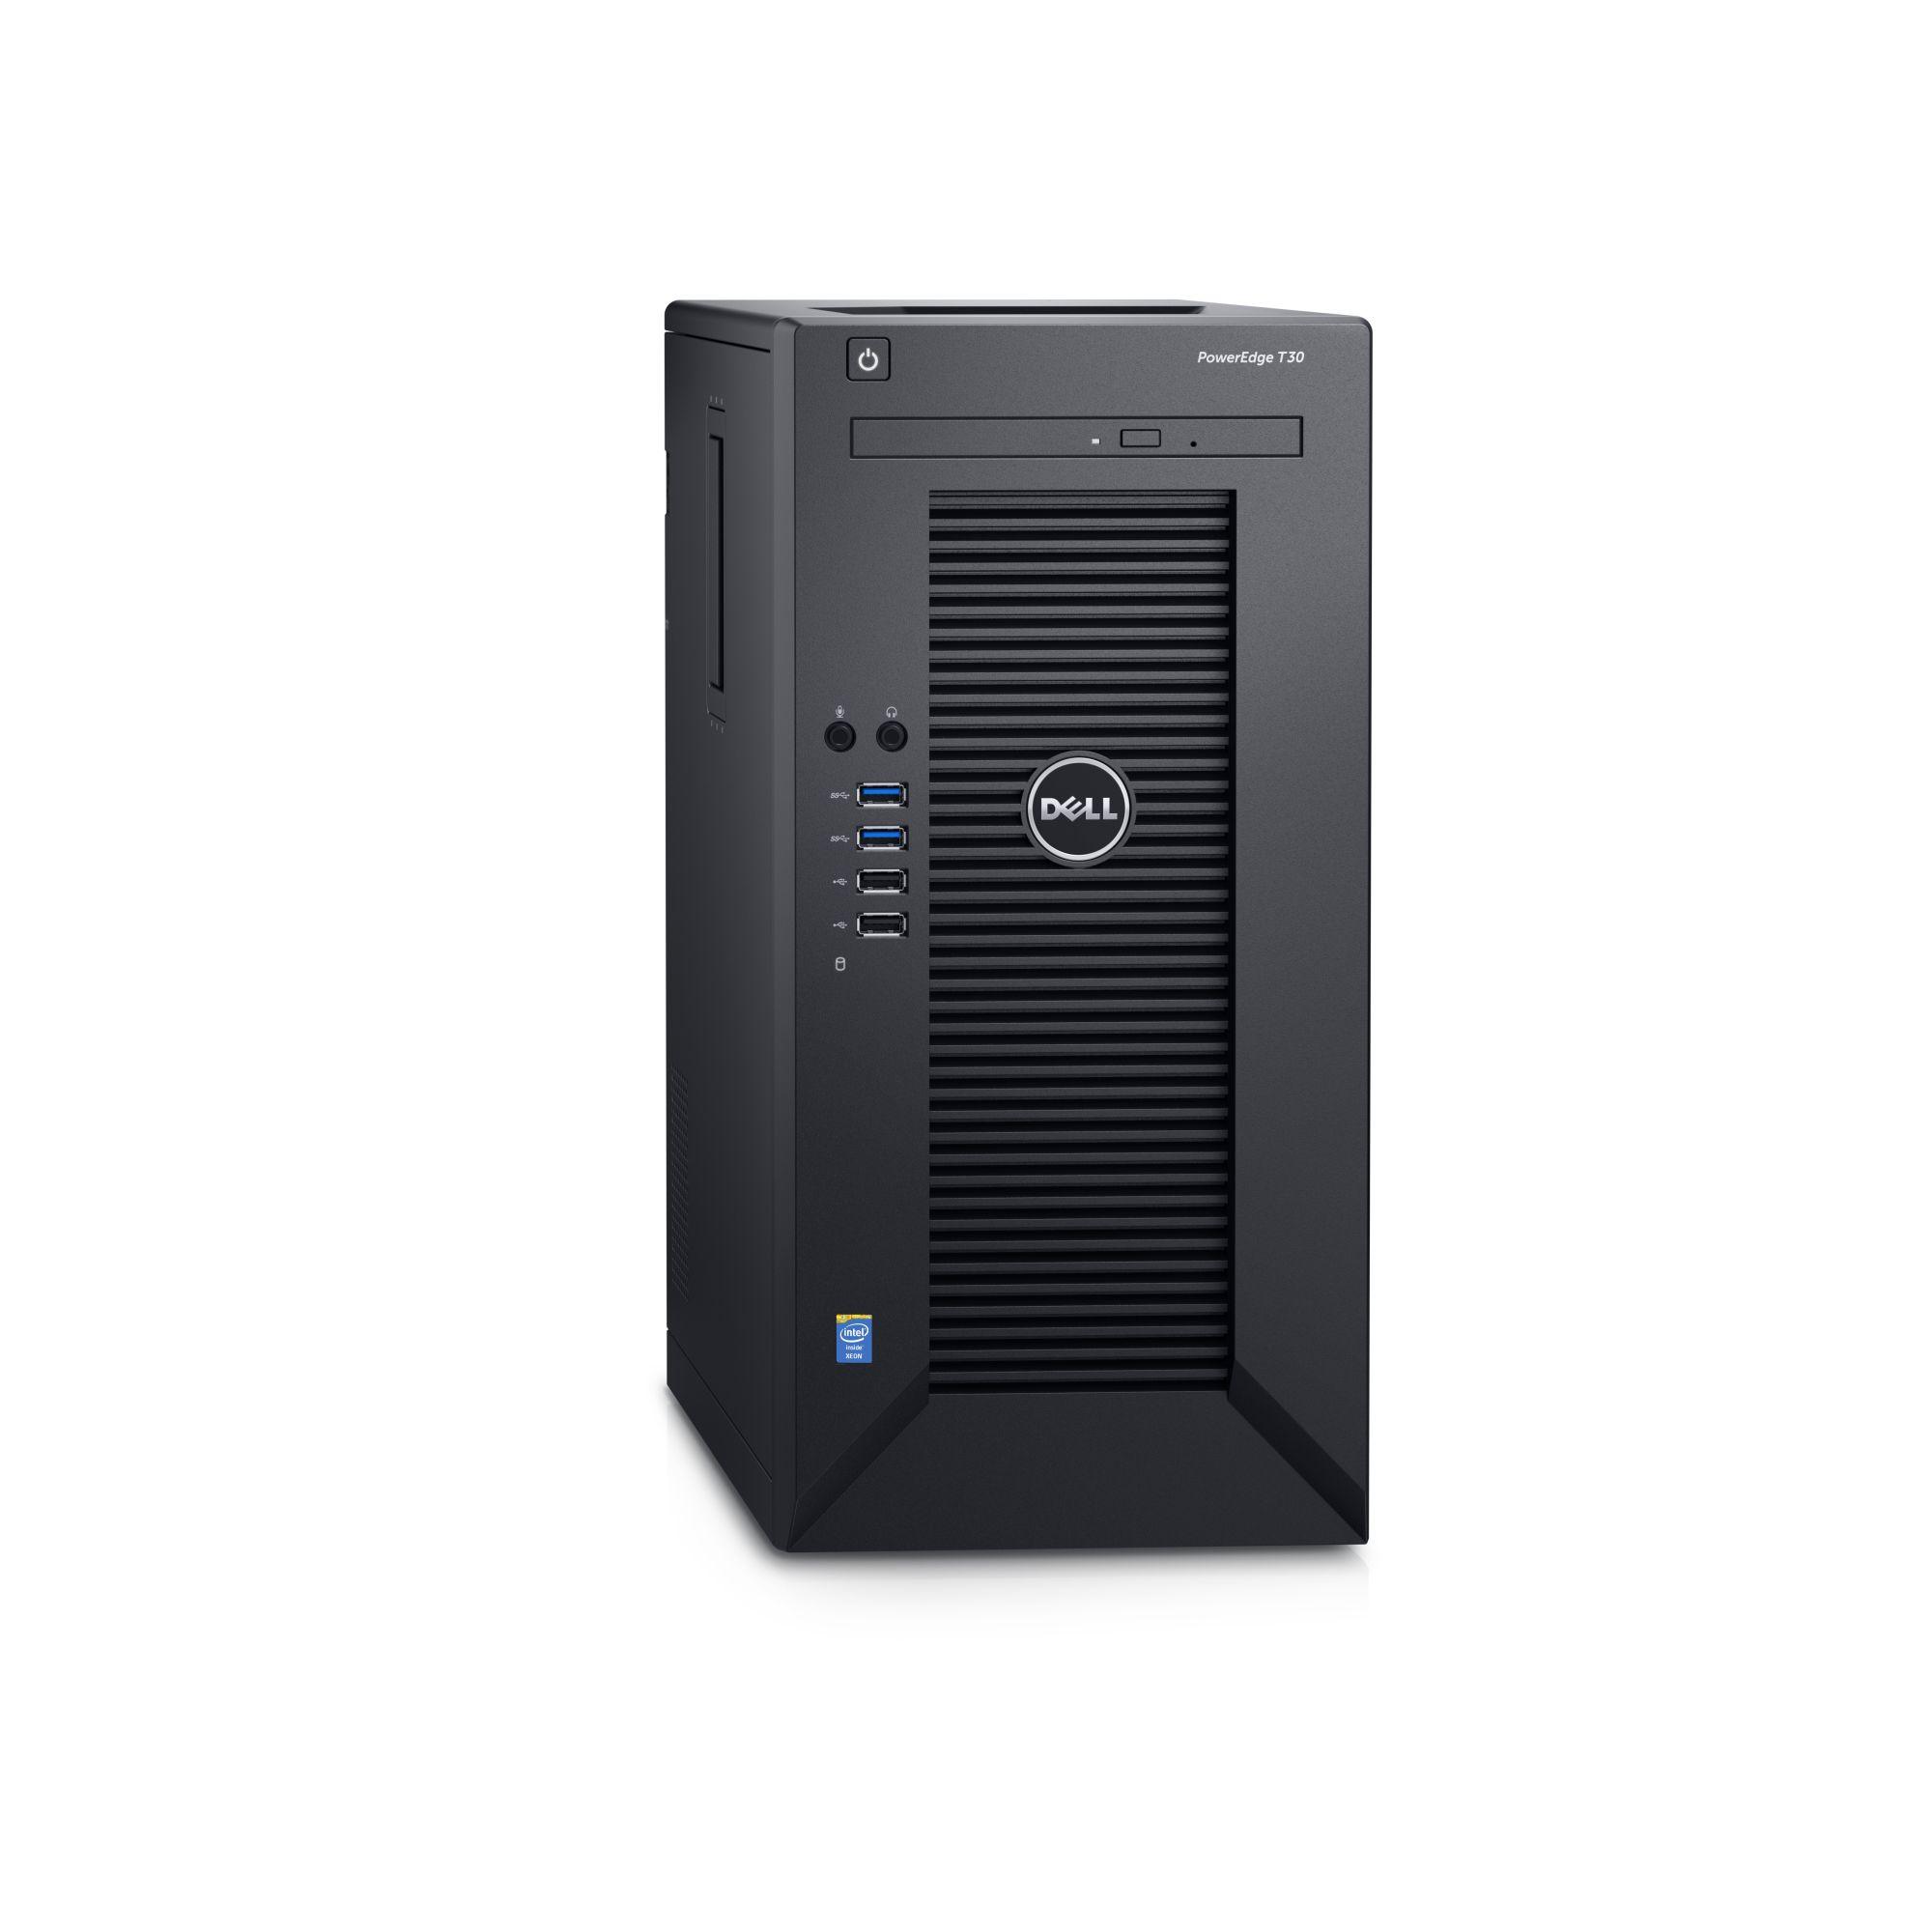 Dell PowerEdge T30 E3-1225 v5/8GB/2x1TB SATA/RAID 1/DVDRW/1xGLAN/290W/3RNBD/Černý